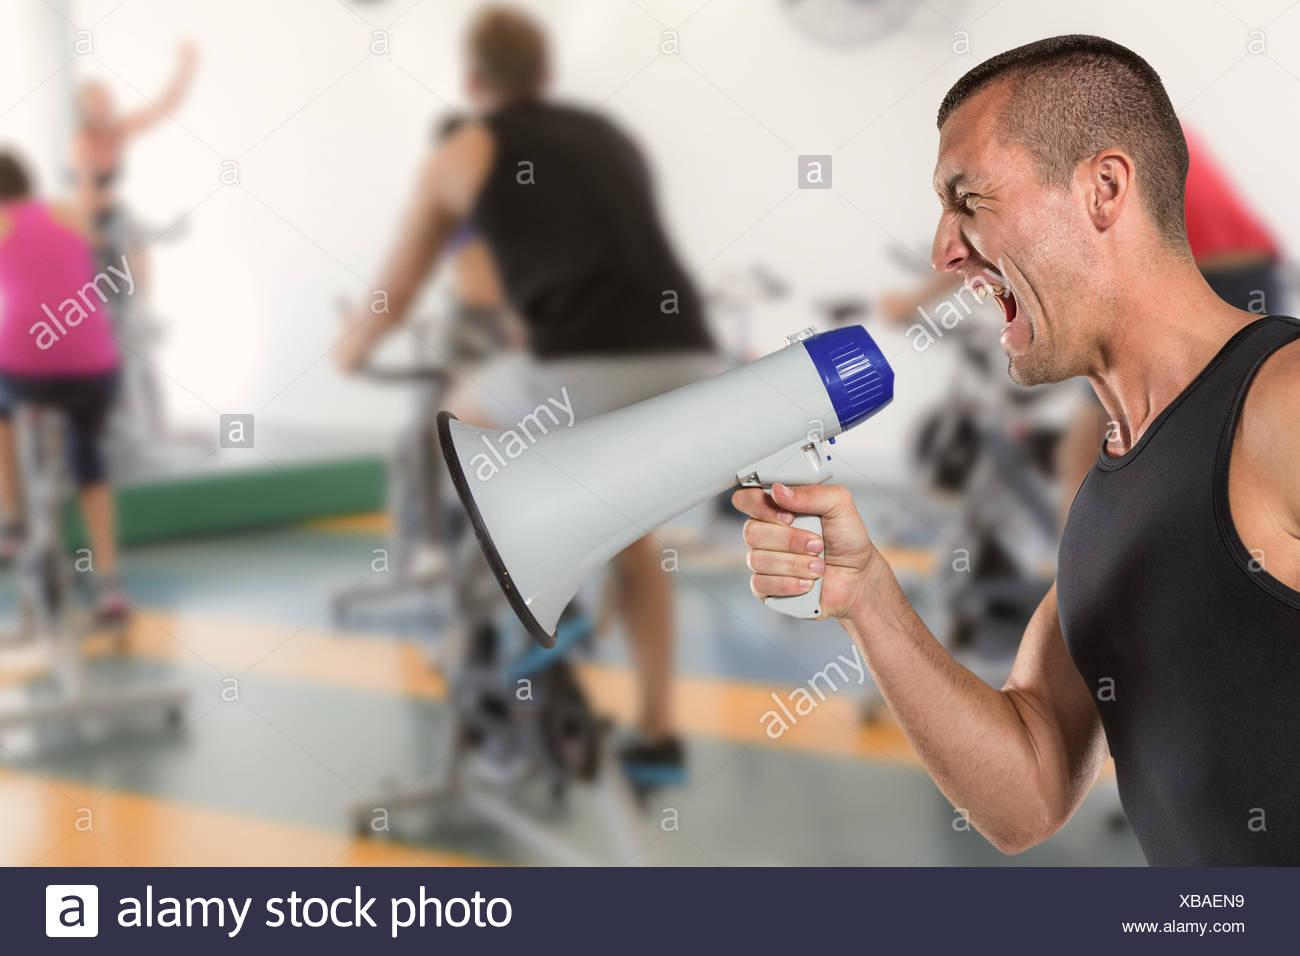 Composite image of irritated male trainer yelling through megaphone - Stock Image